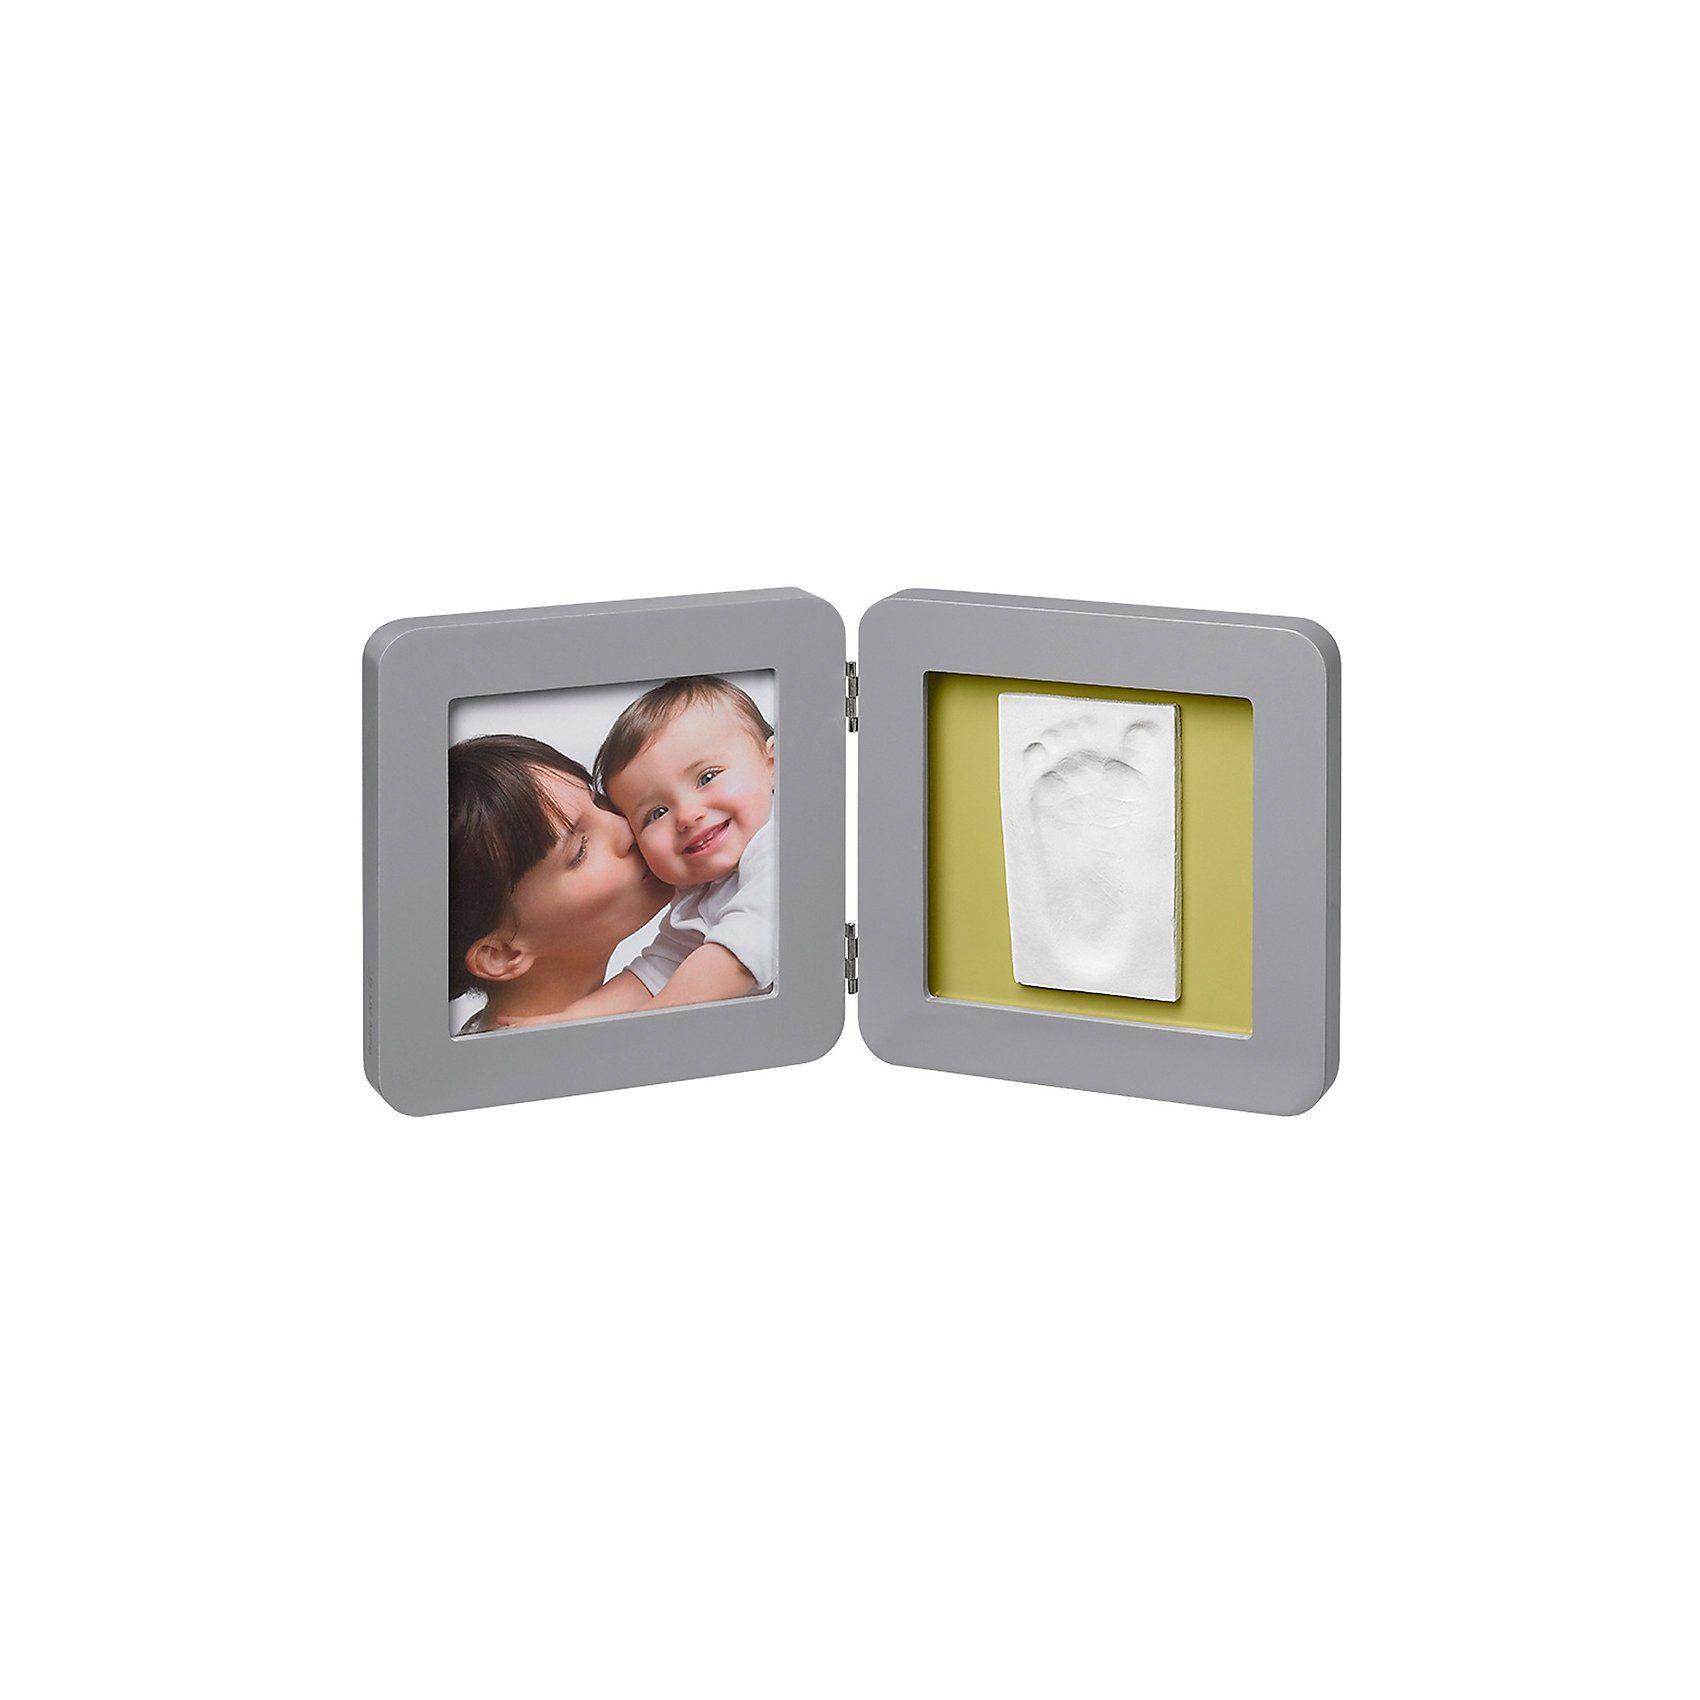 Baby Art Gipsabdruck Set mit 2-tlg. Bilderrahmen, grey